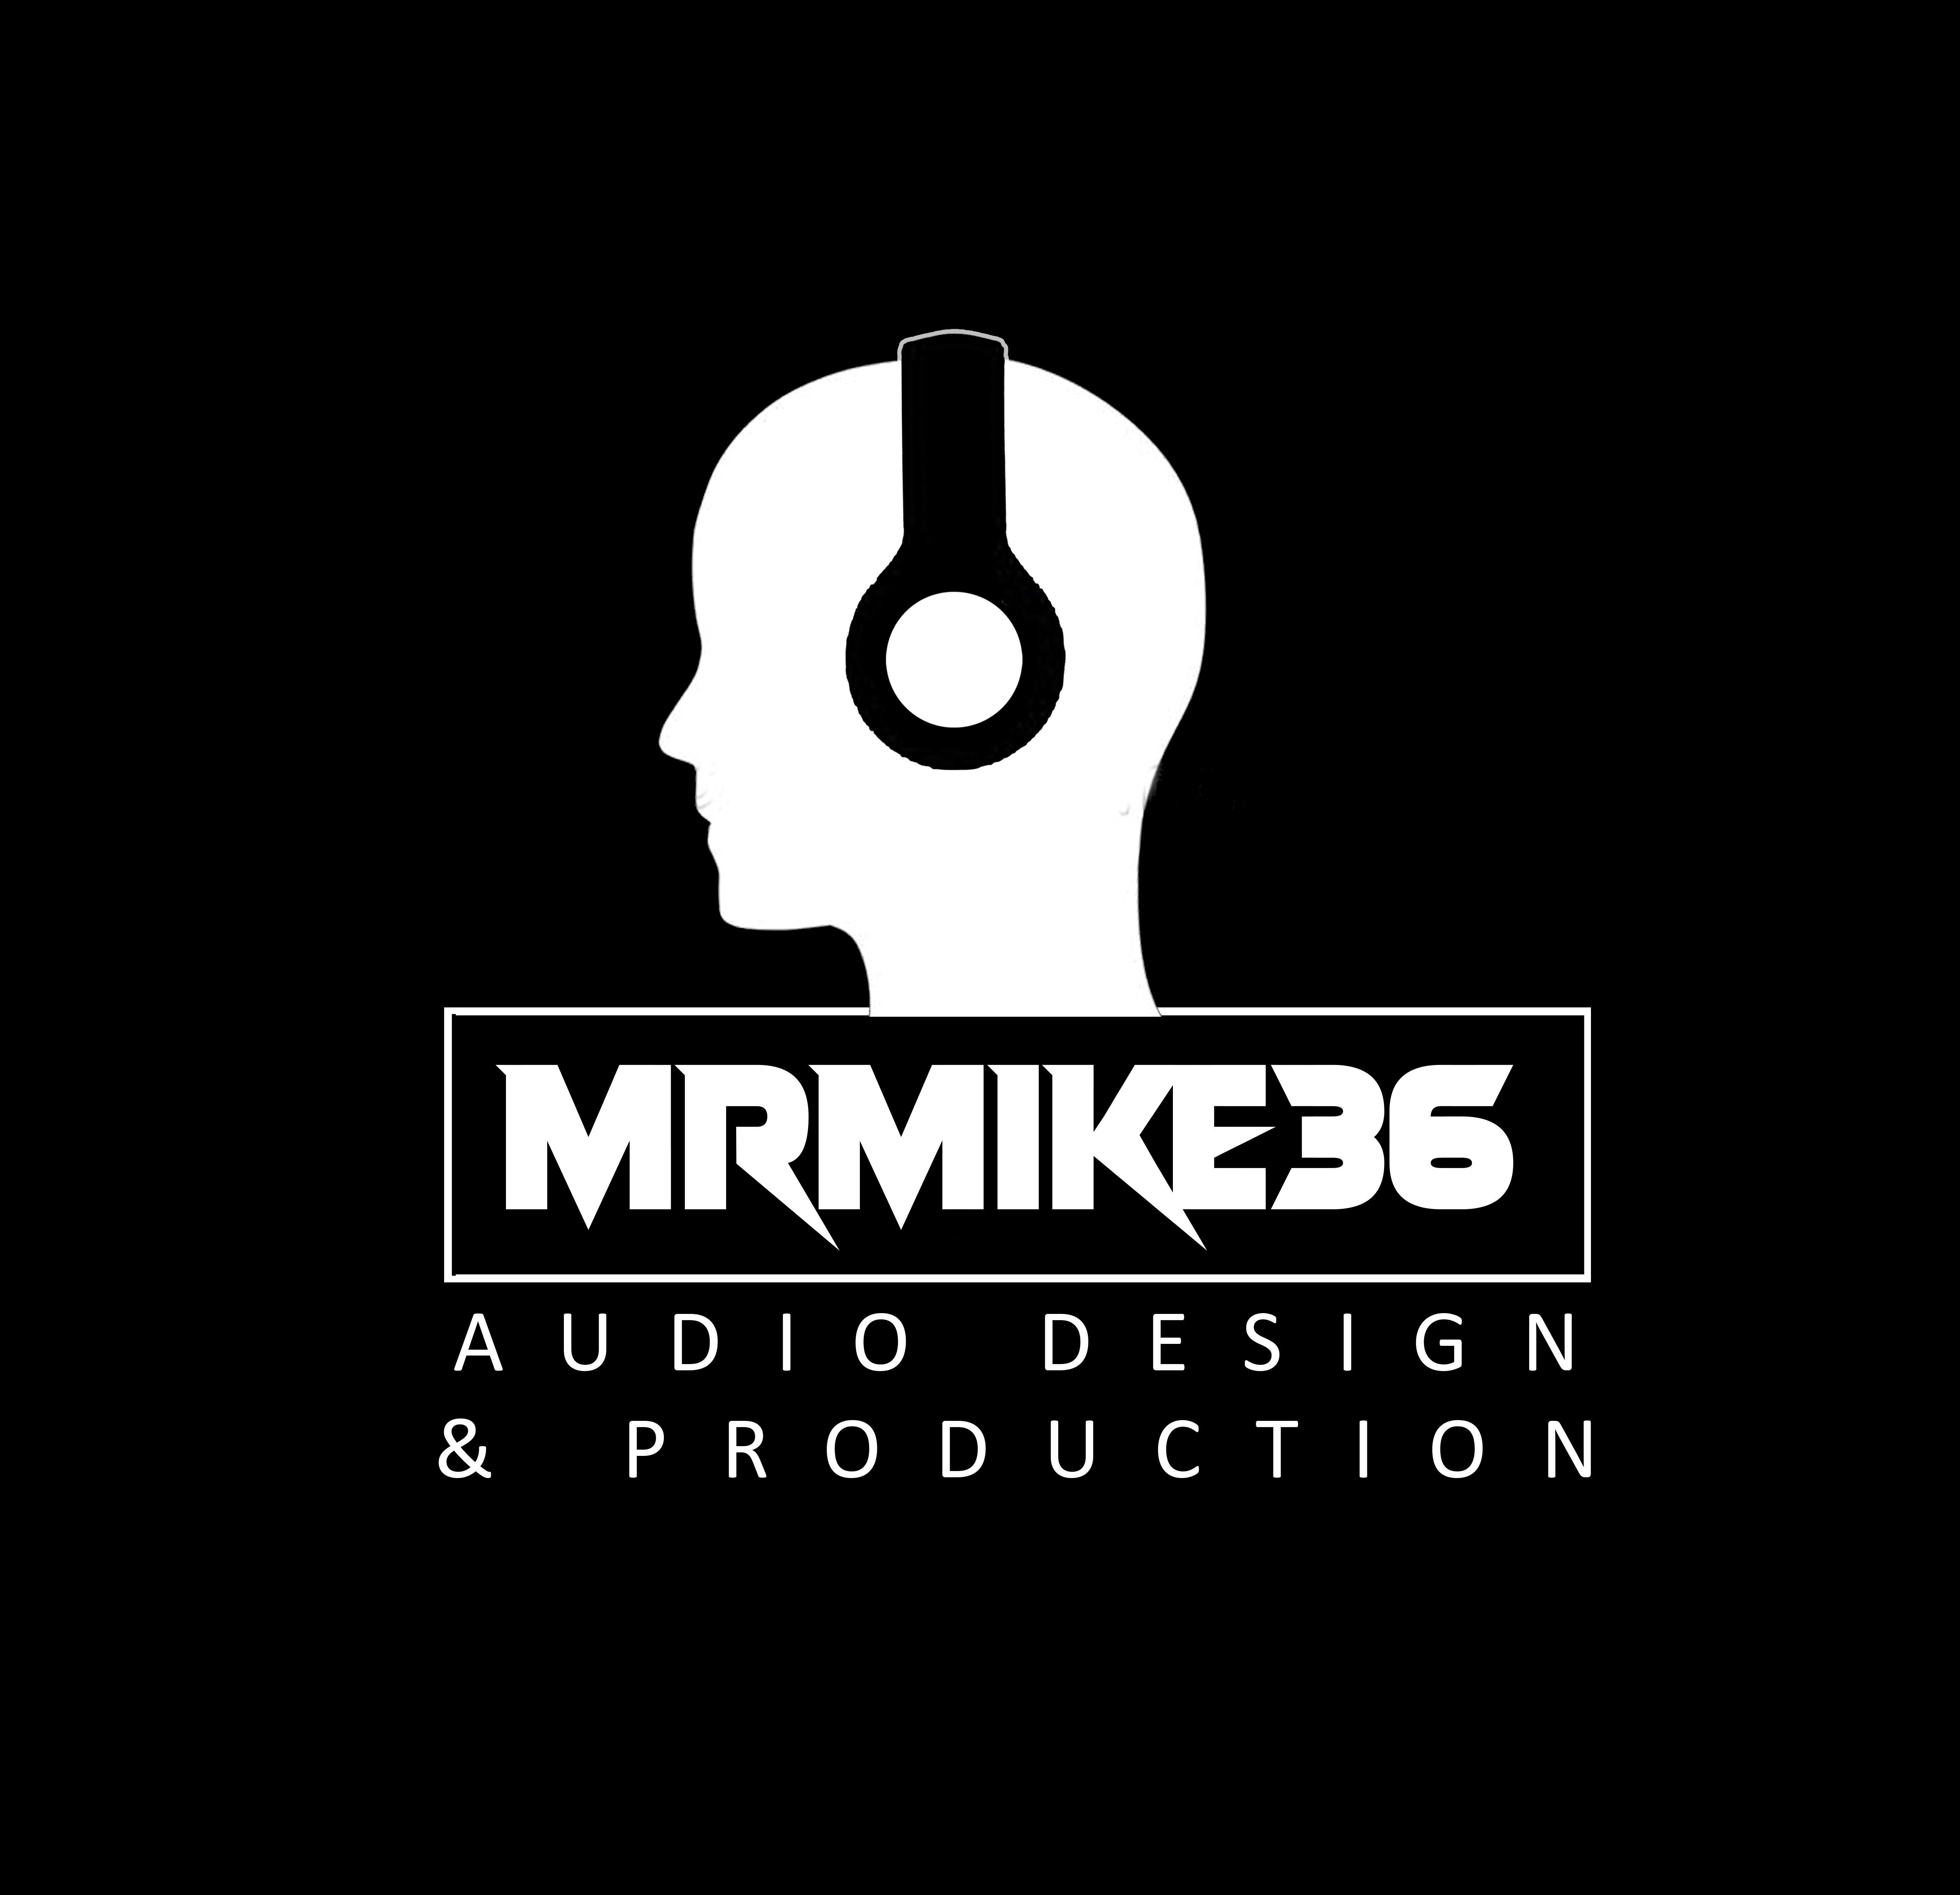 MADMIKE36-black